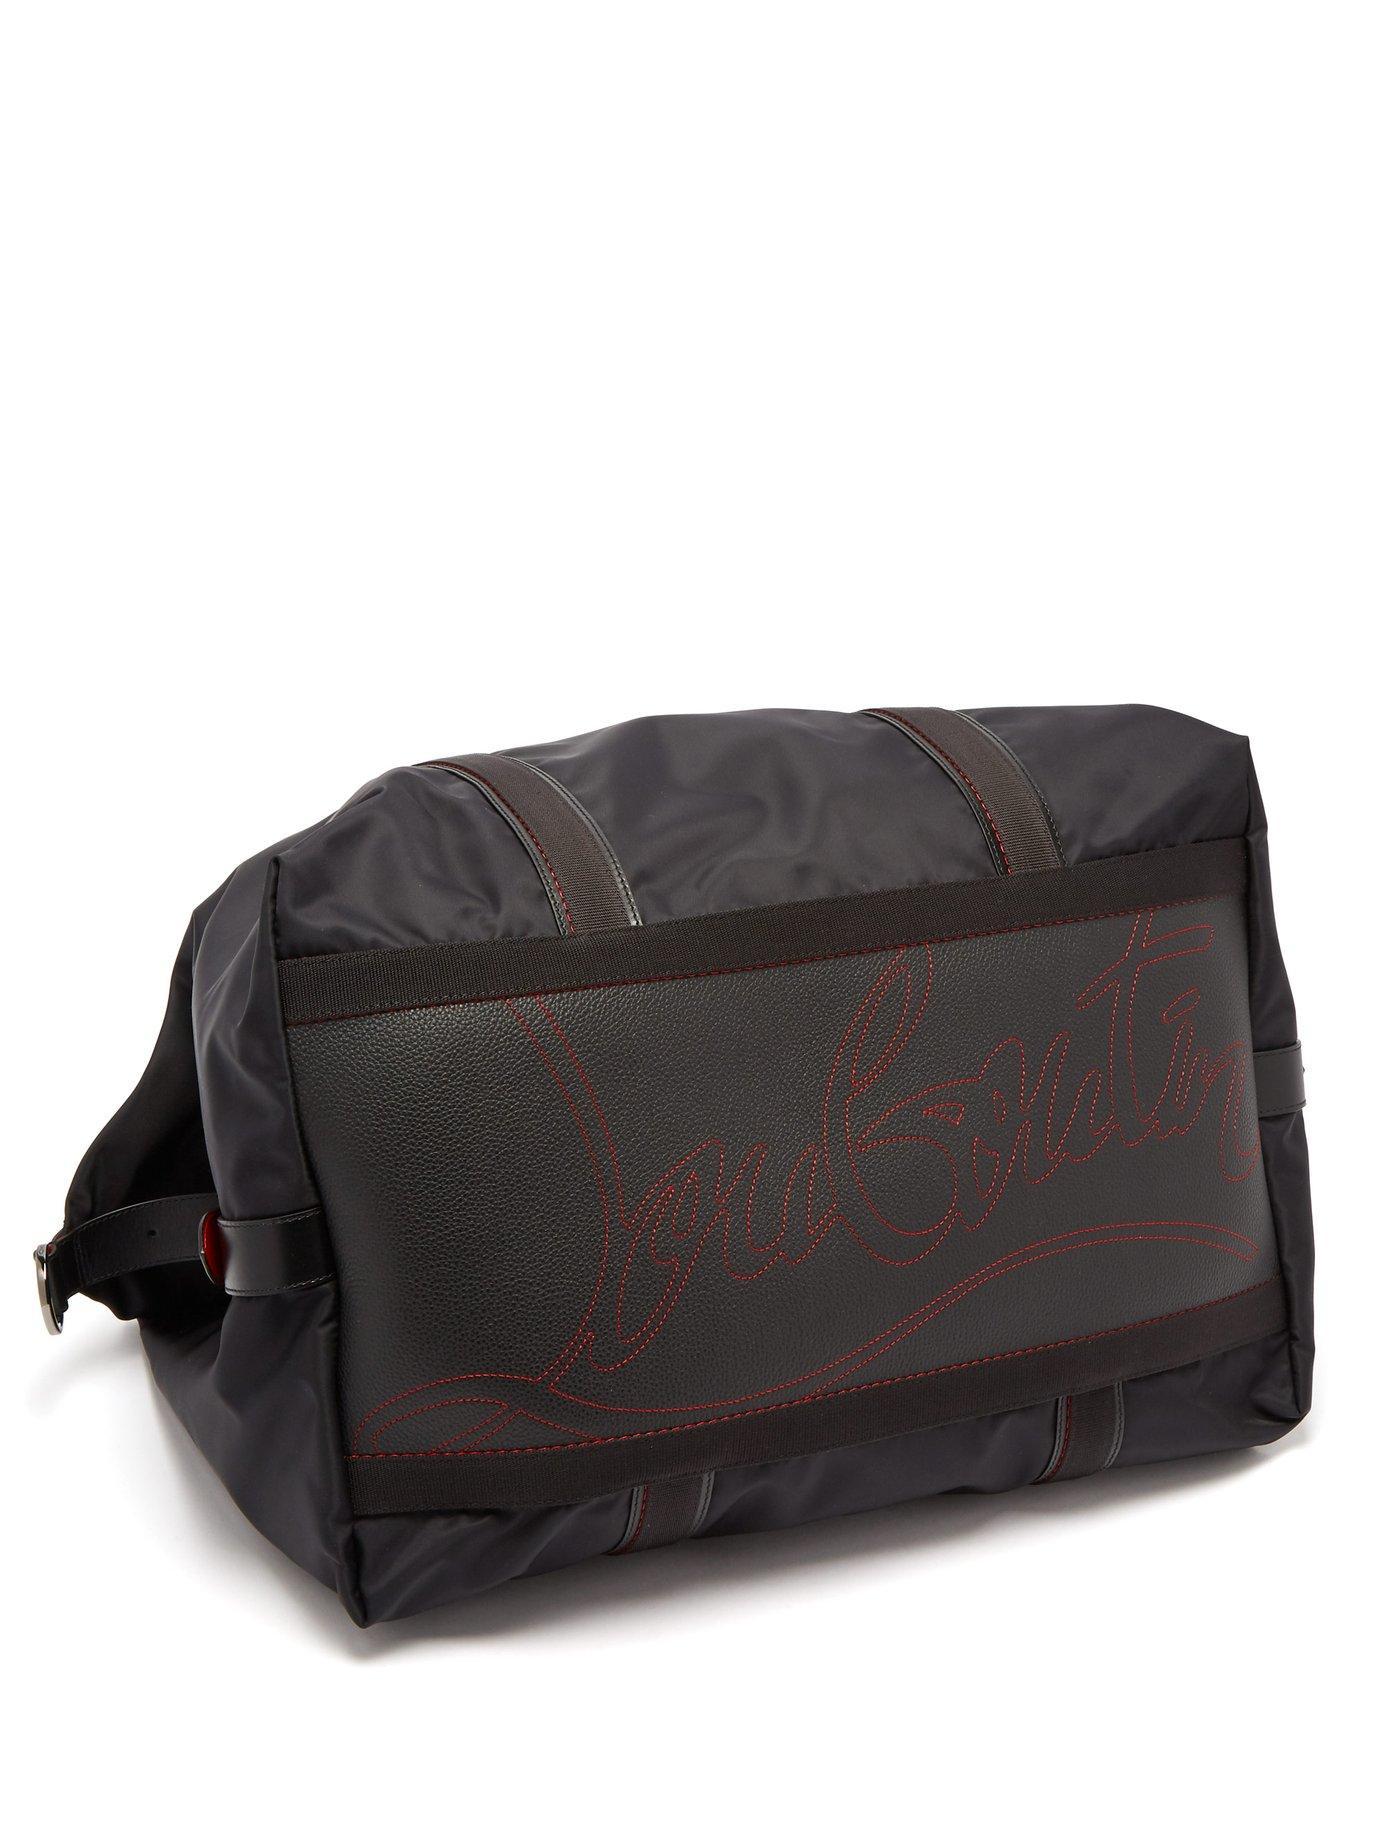 0c5d0e2ce778 Christian Louboutin - Black Parislisboa Double Handle Weekend Bag for Men -  Lyst. View fullscreen